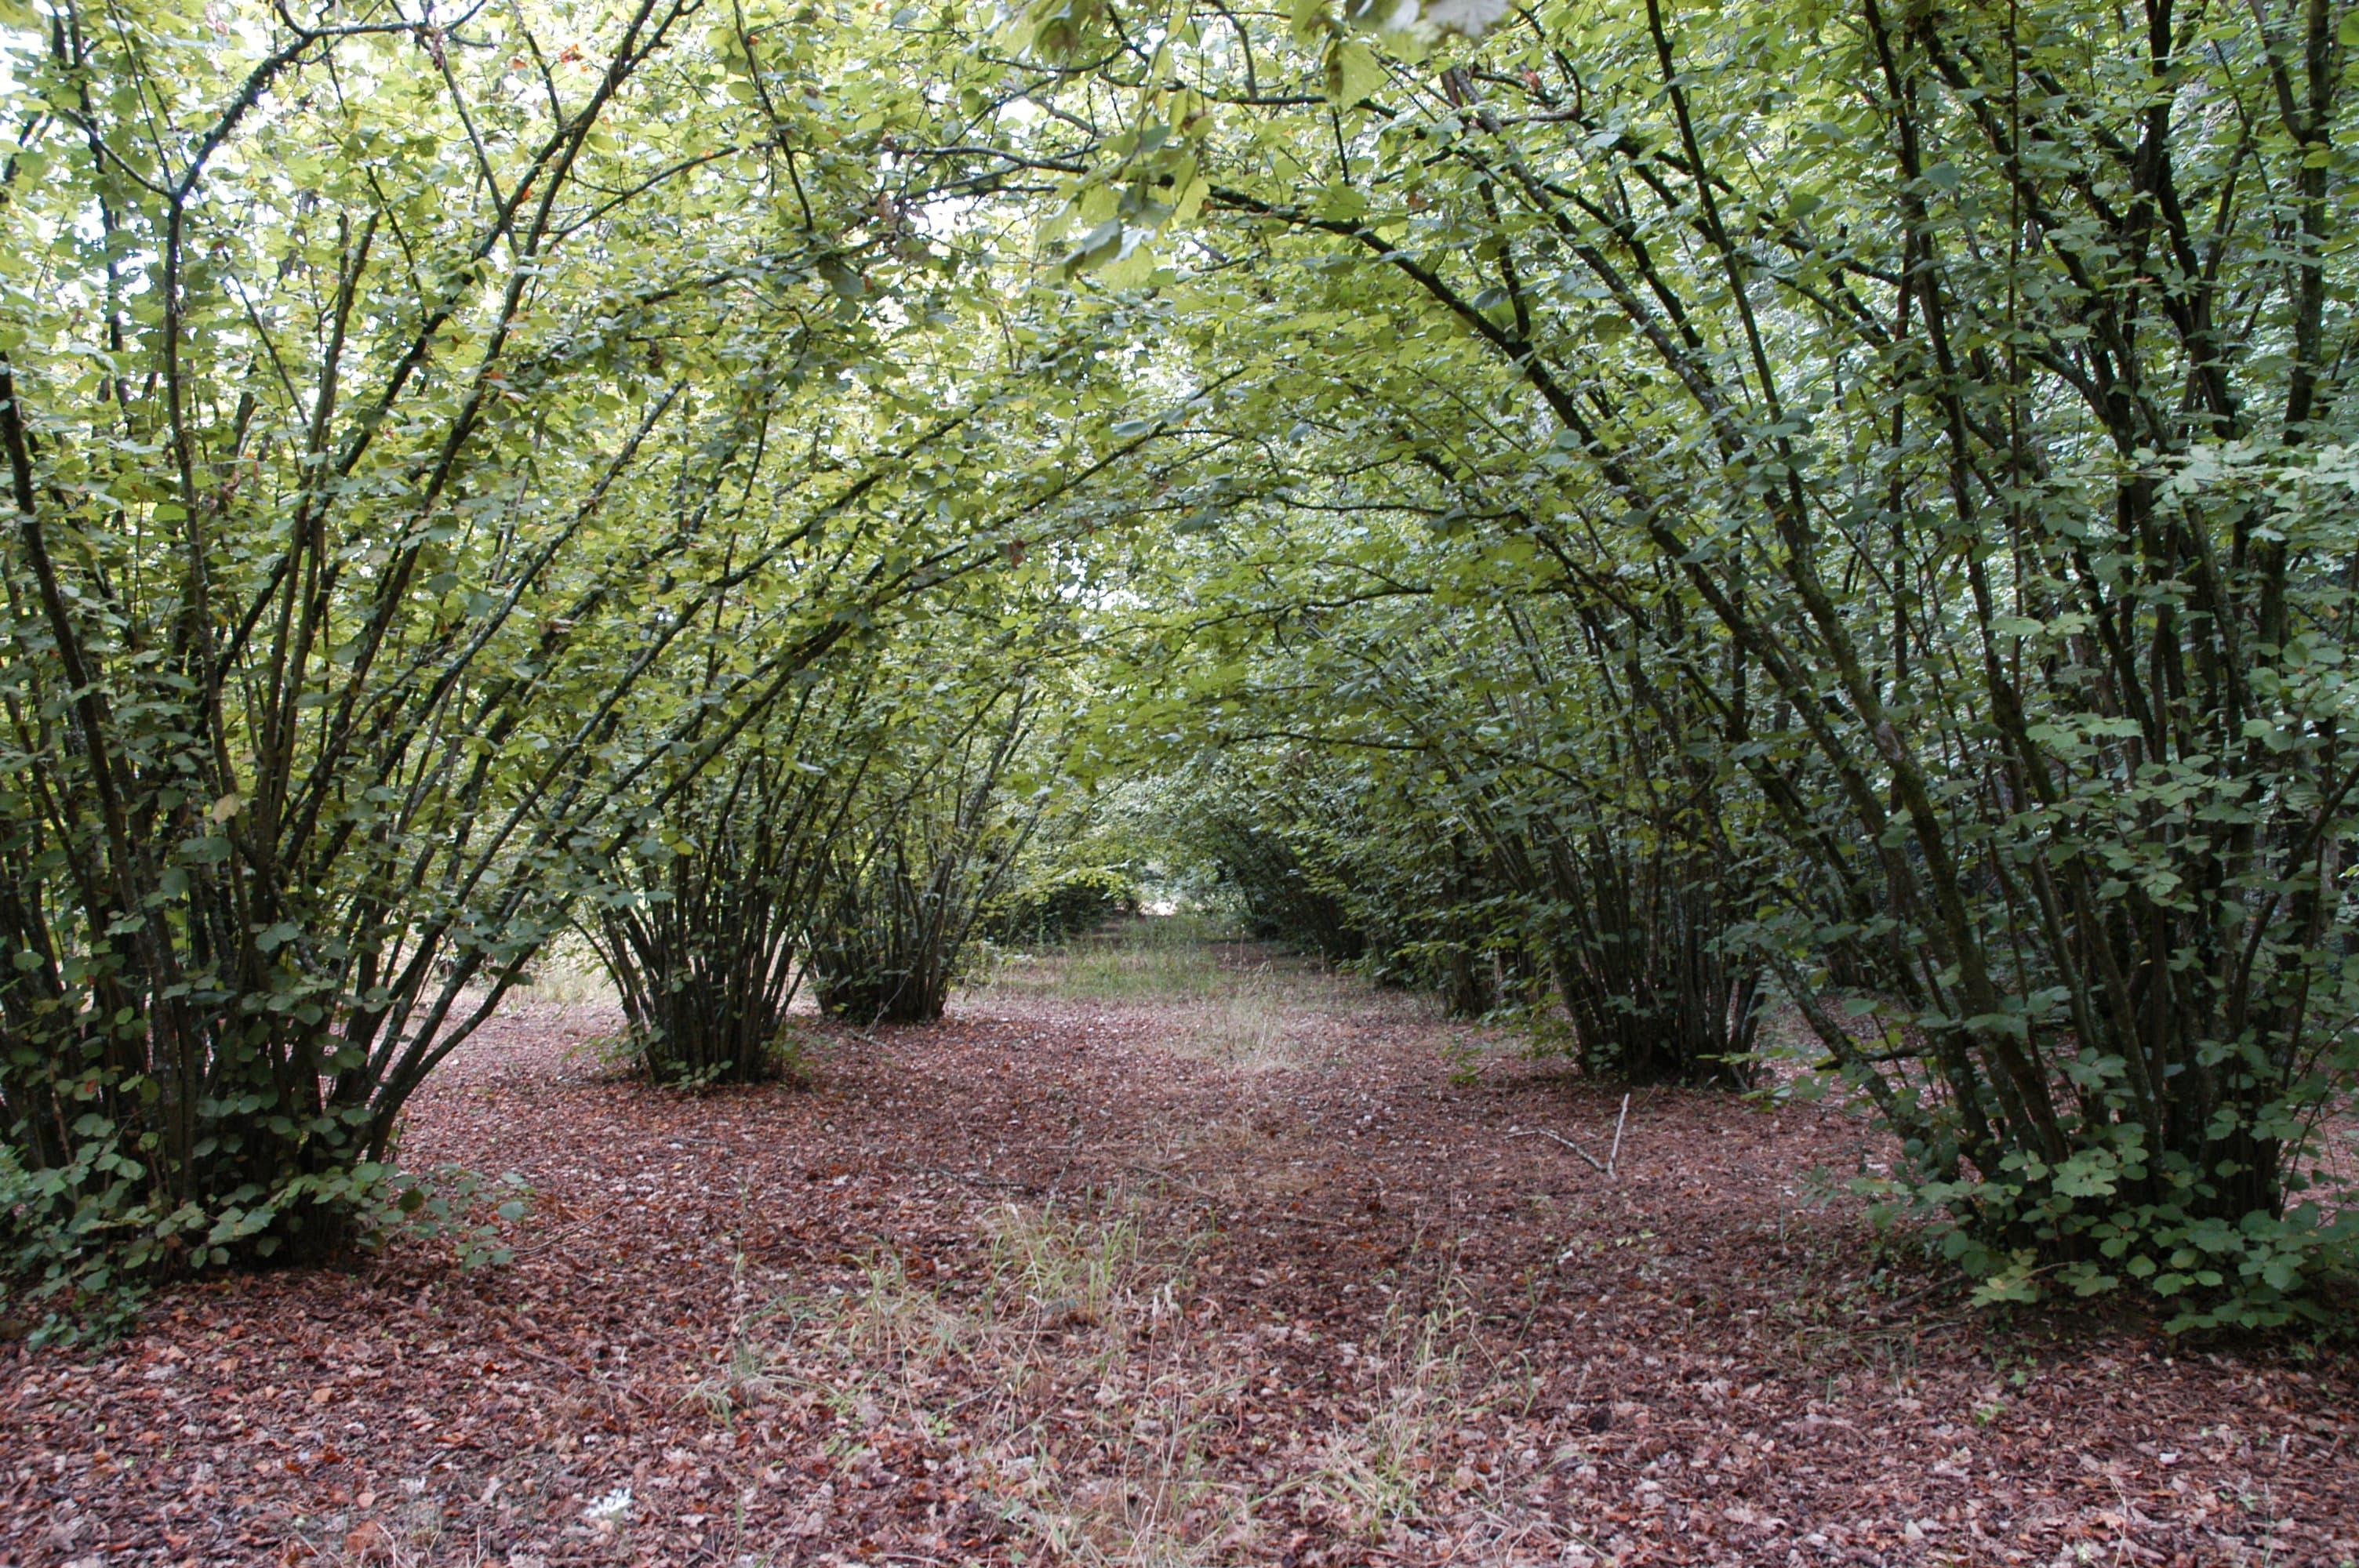 Productes Singulars De La Selva: Avellana De Brunyola